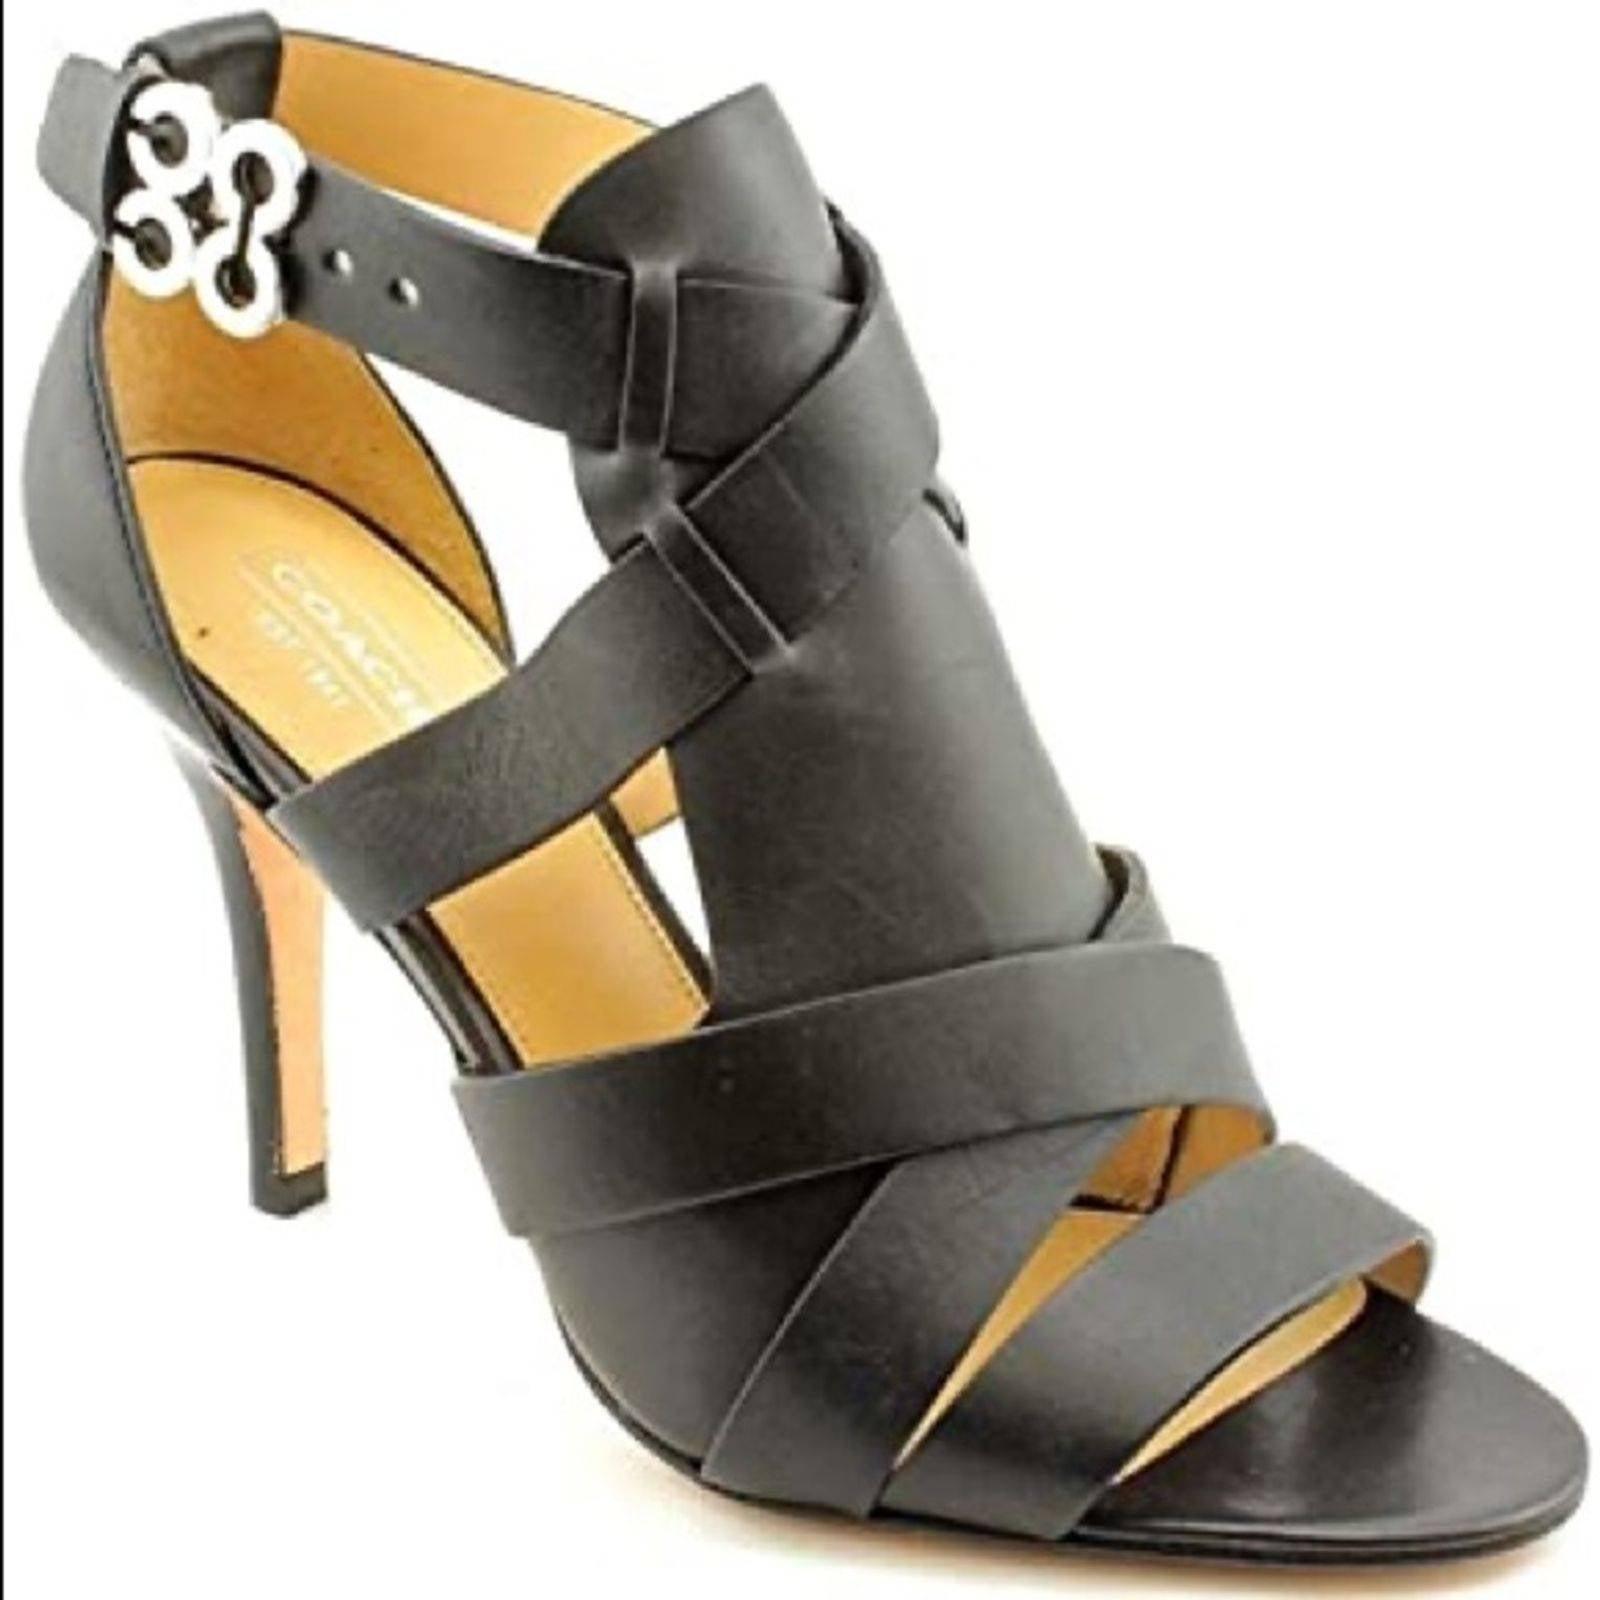 COACH Mila Black Gladiator Heels Sandals